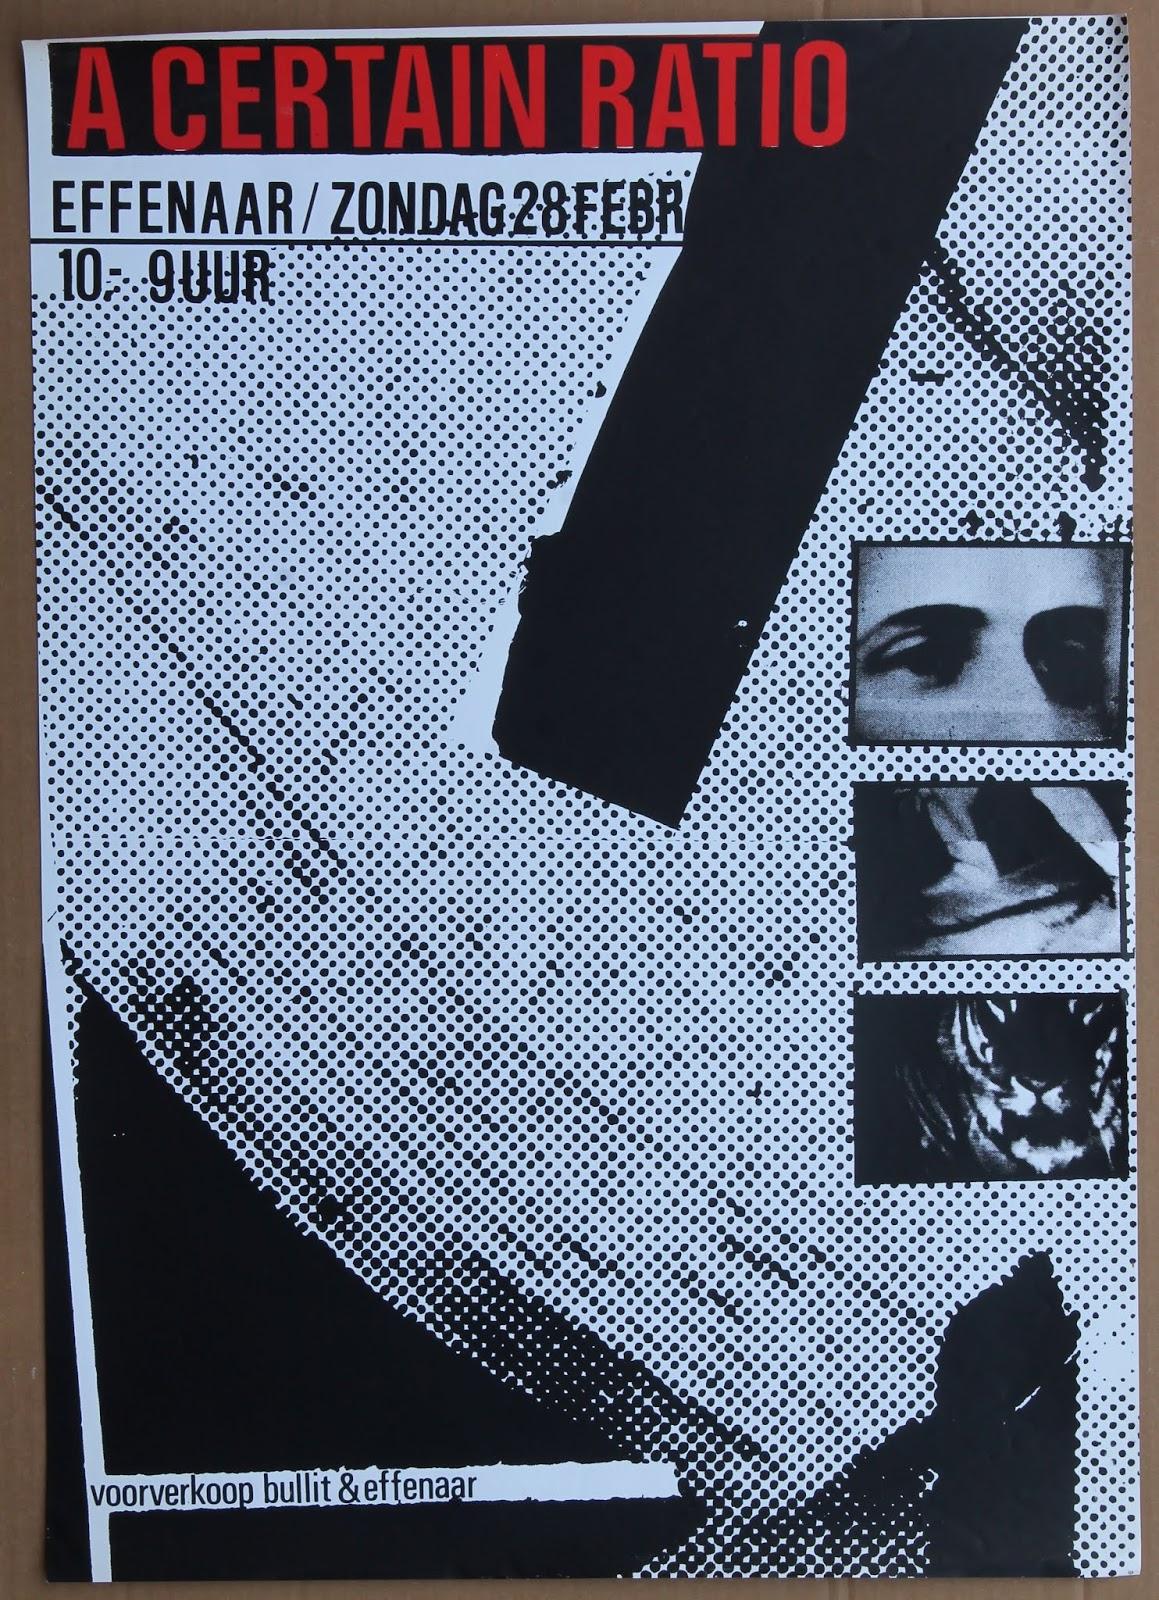 28 Feb 1982, Effenaar, Eindhoven, Netherlands - ACR Gigography